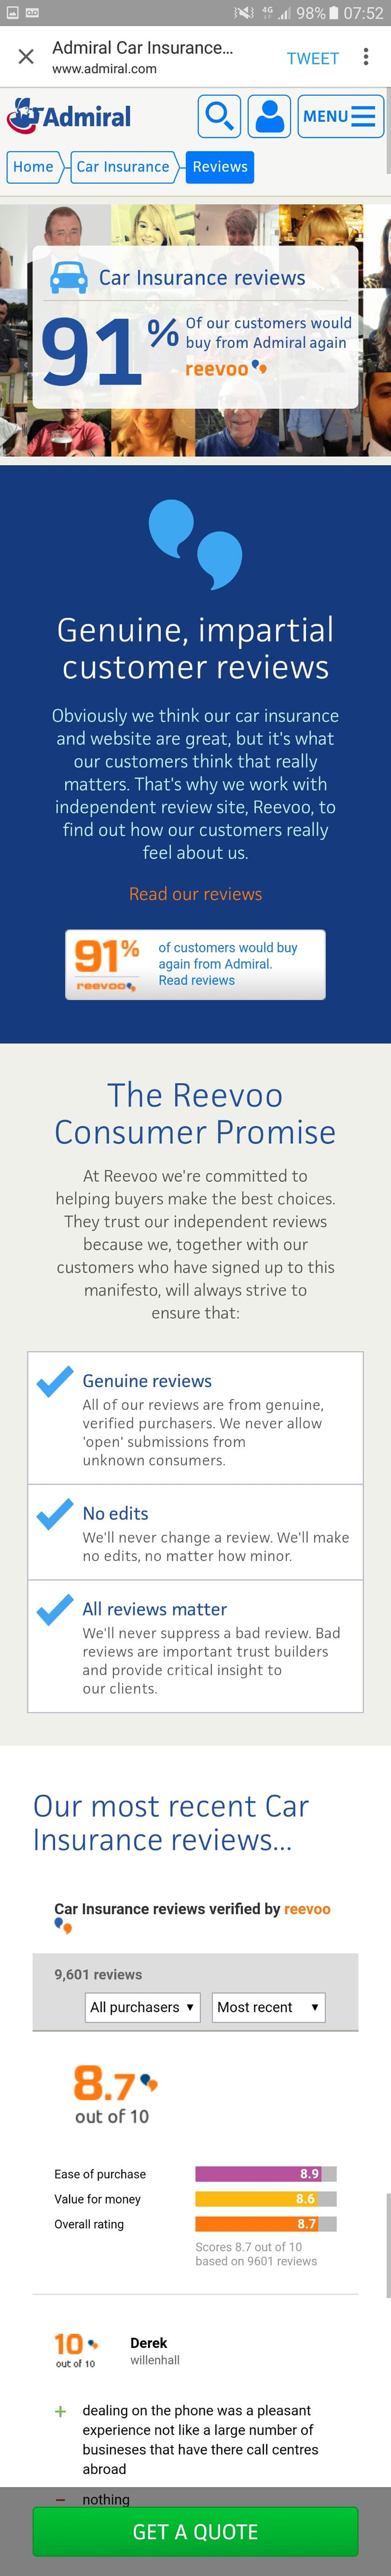 Admiral UK car insurance reviews mobile site